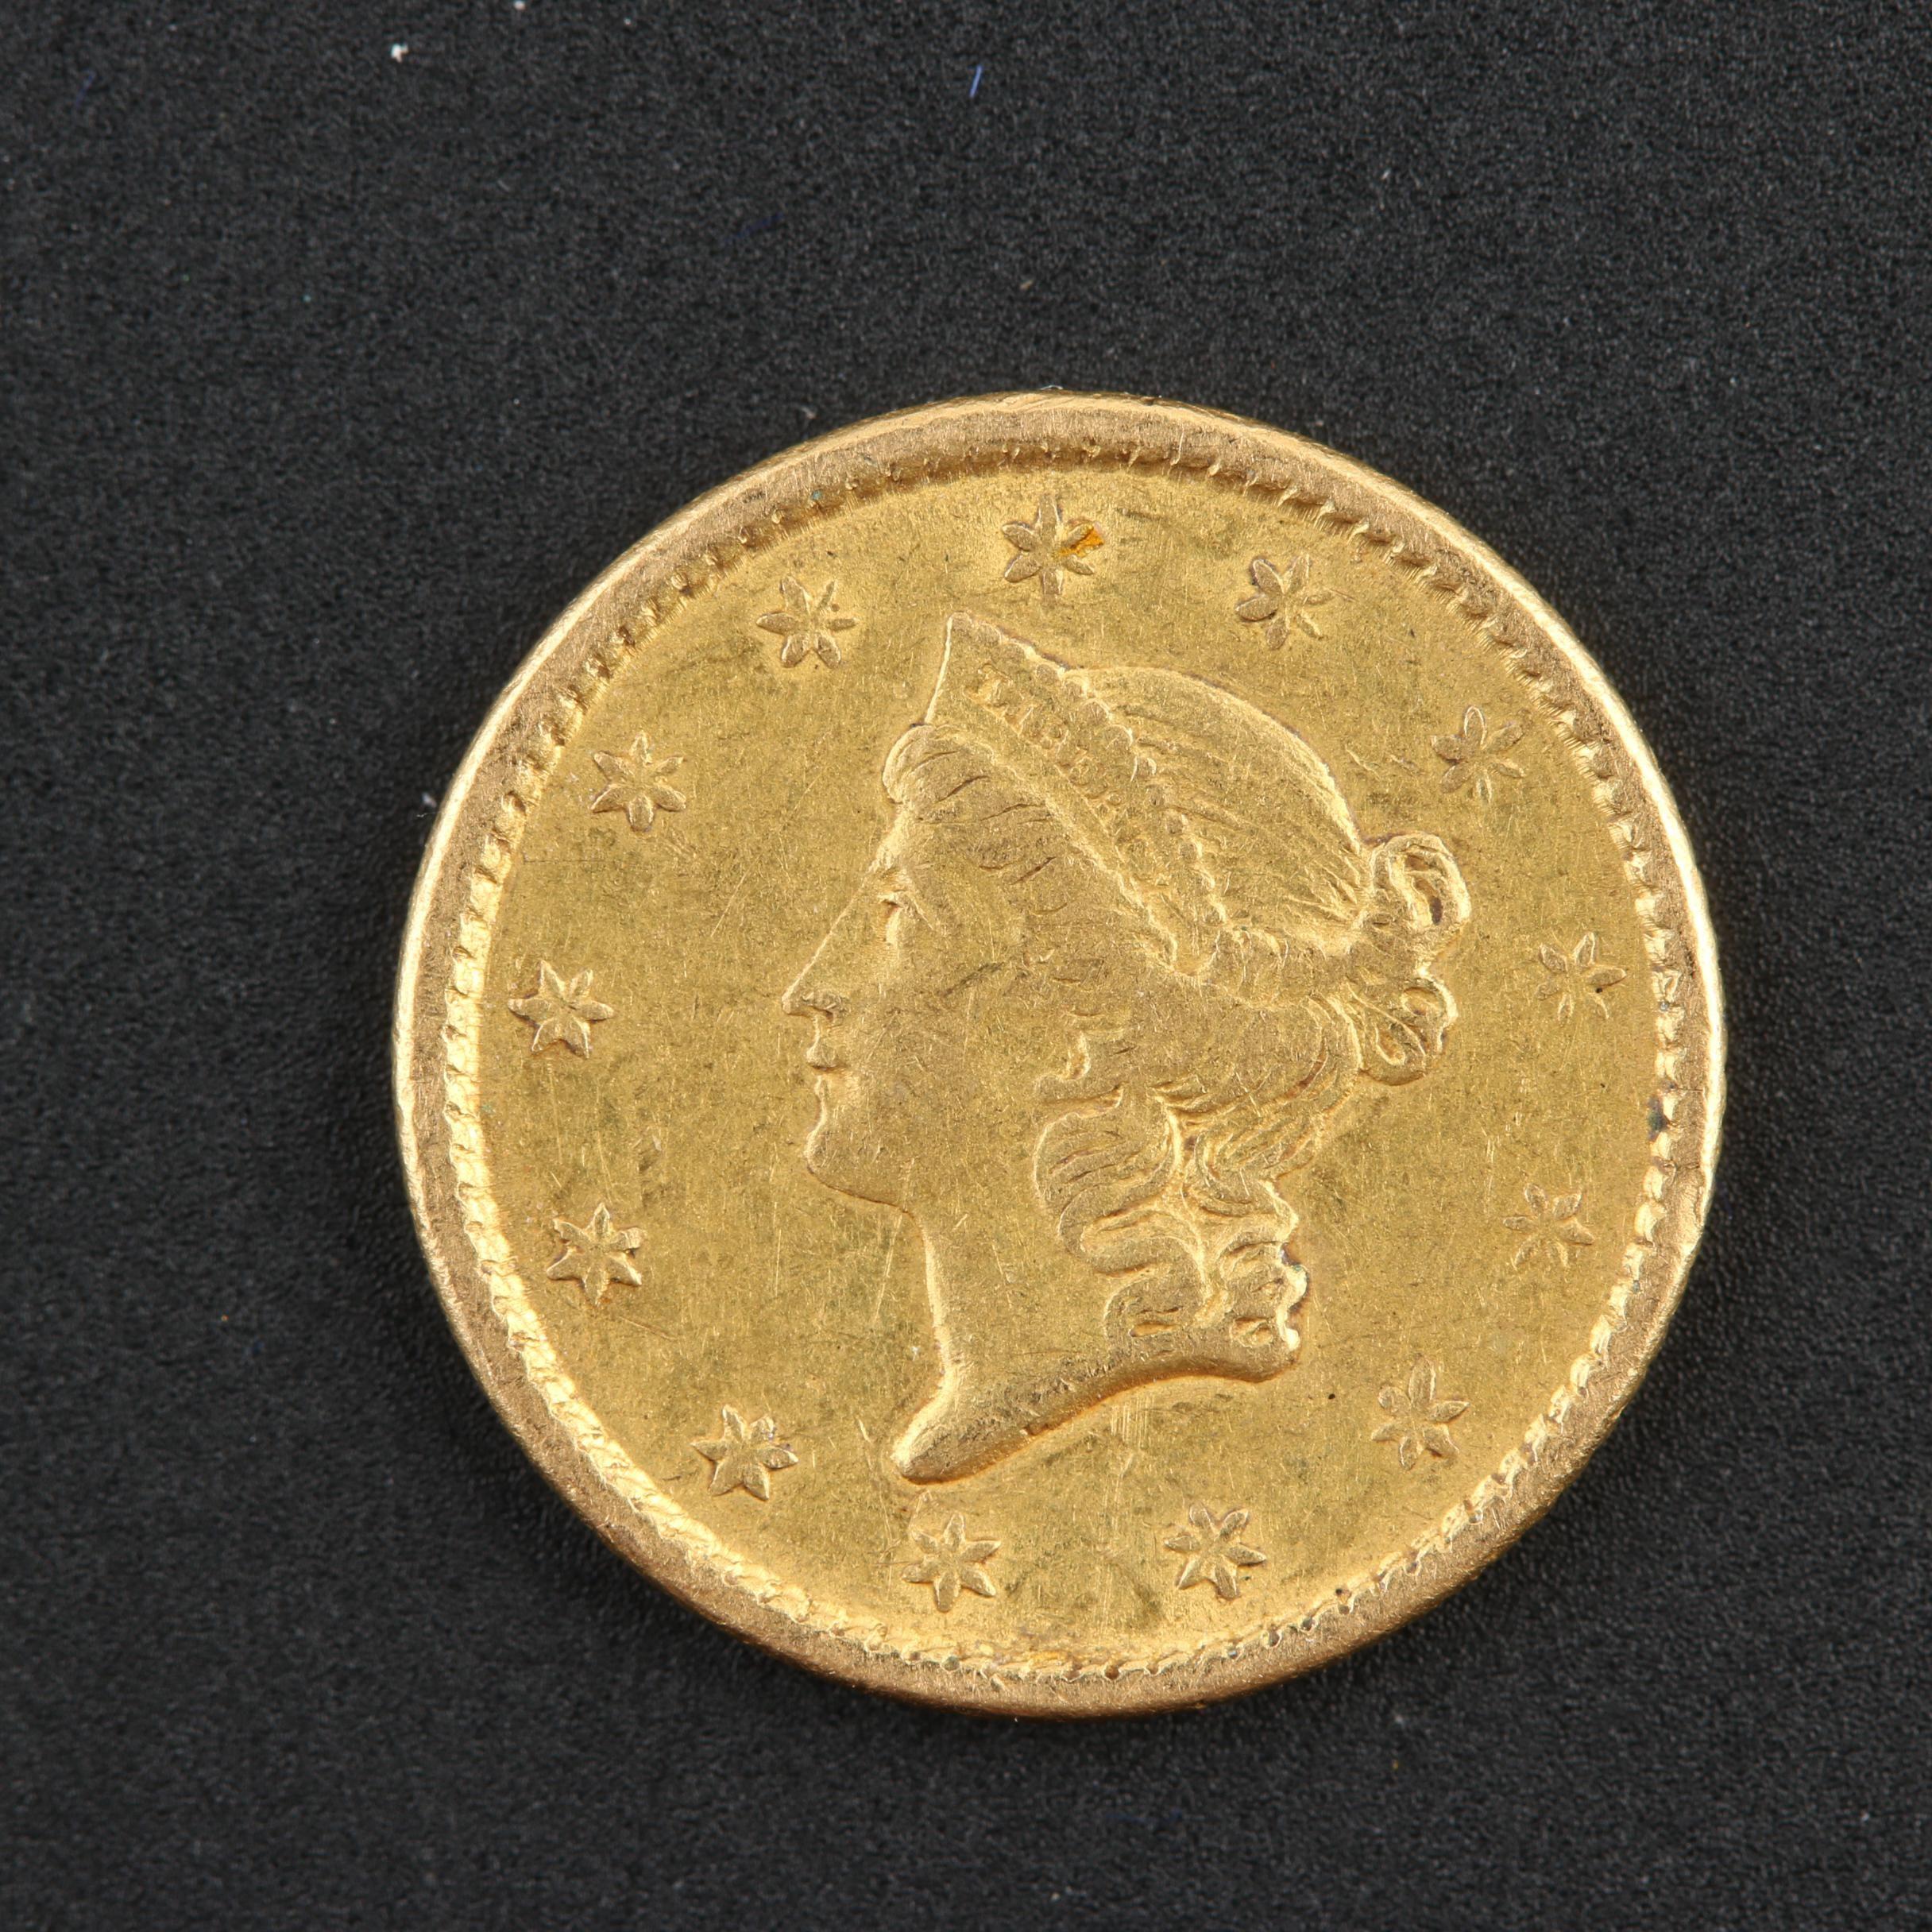 1851 Liberty Head $1 Gold Coin